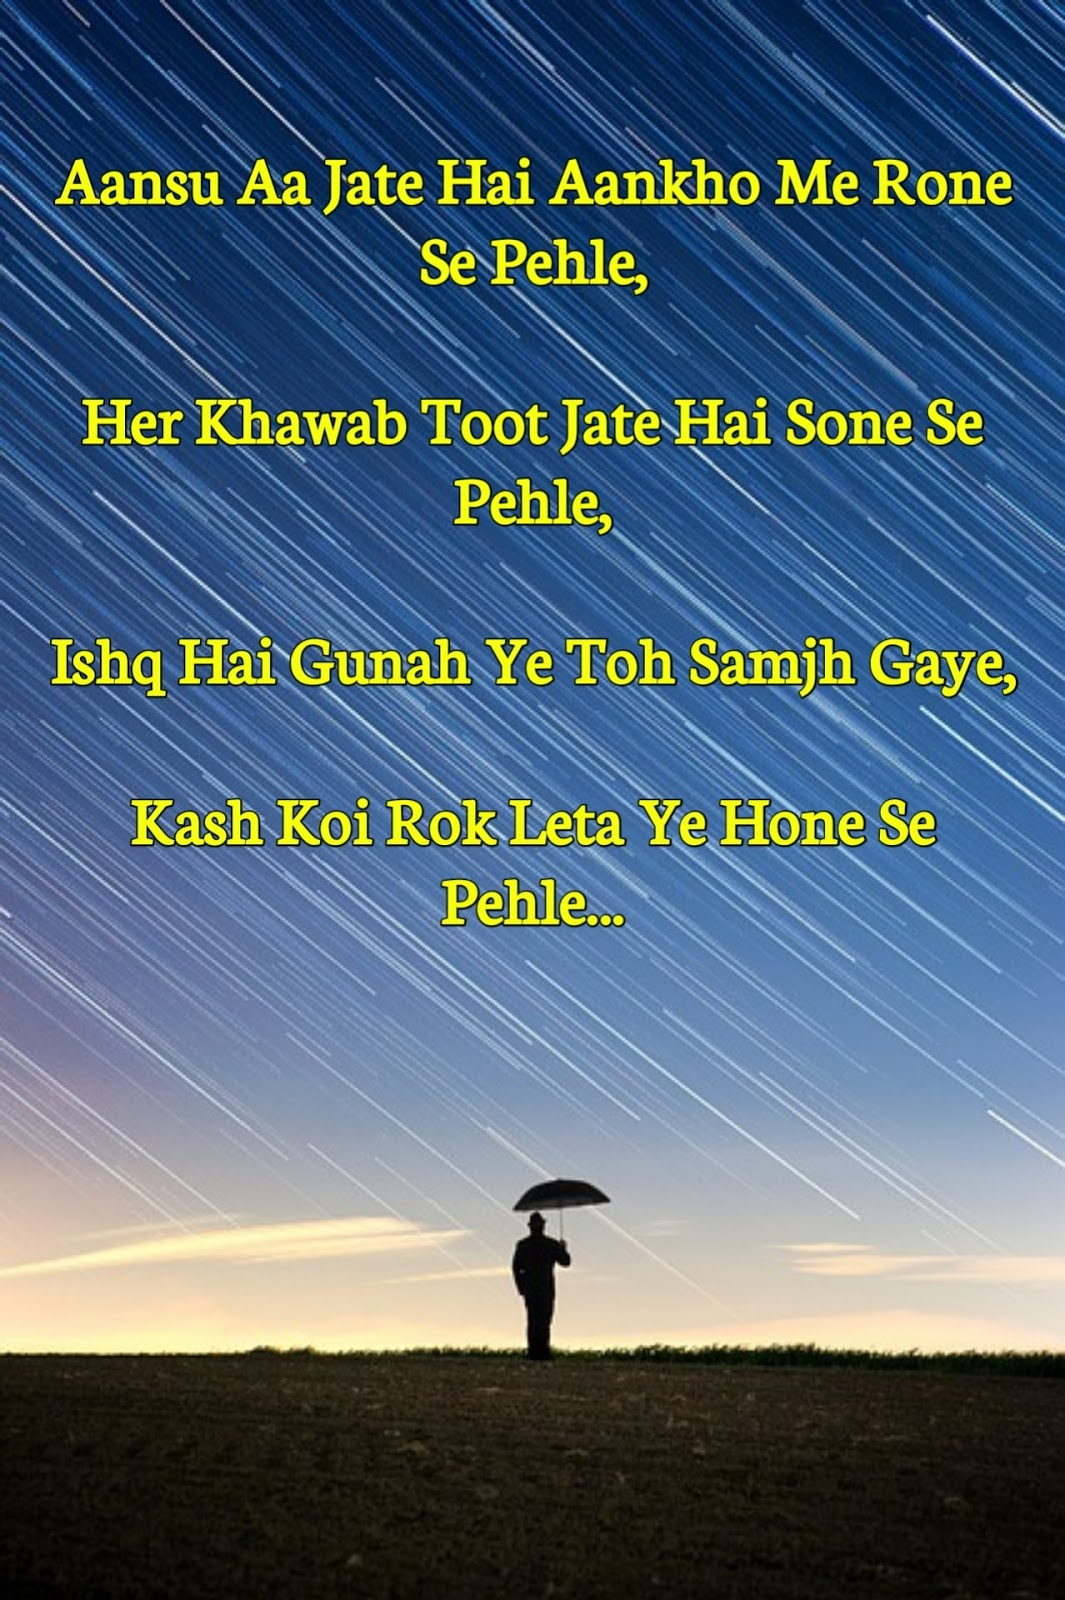 New sad love shayari